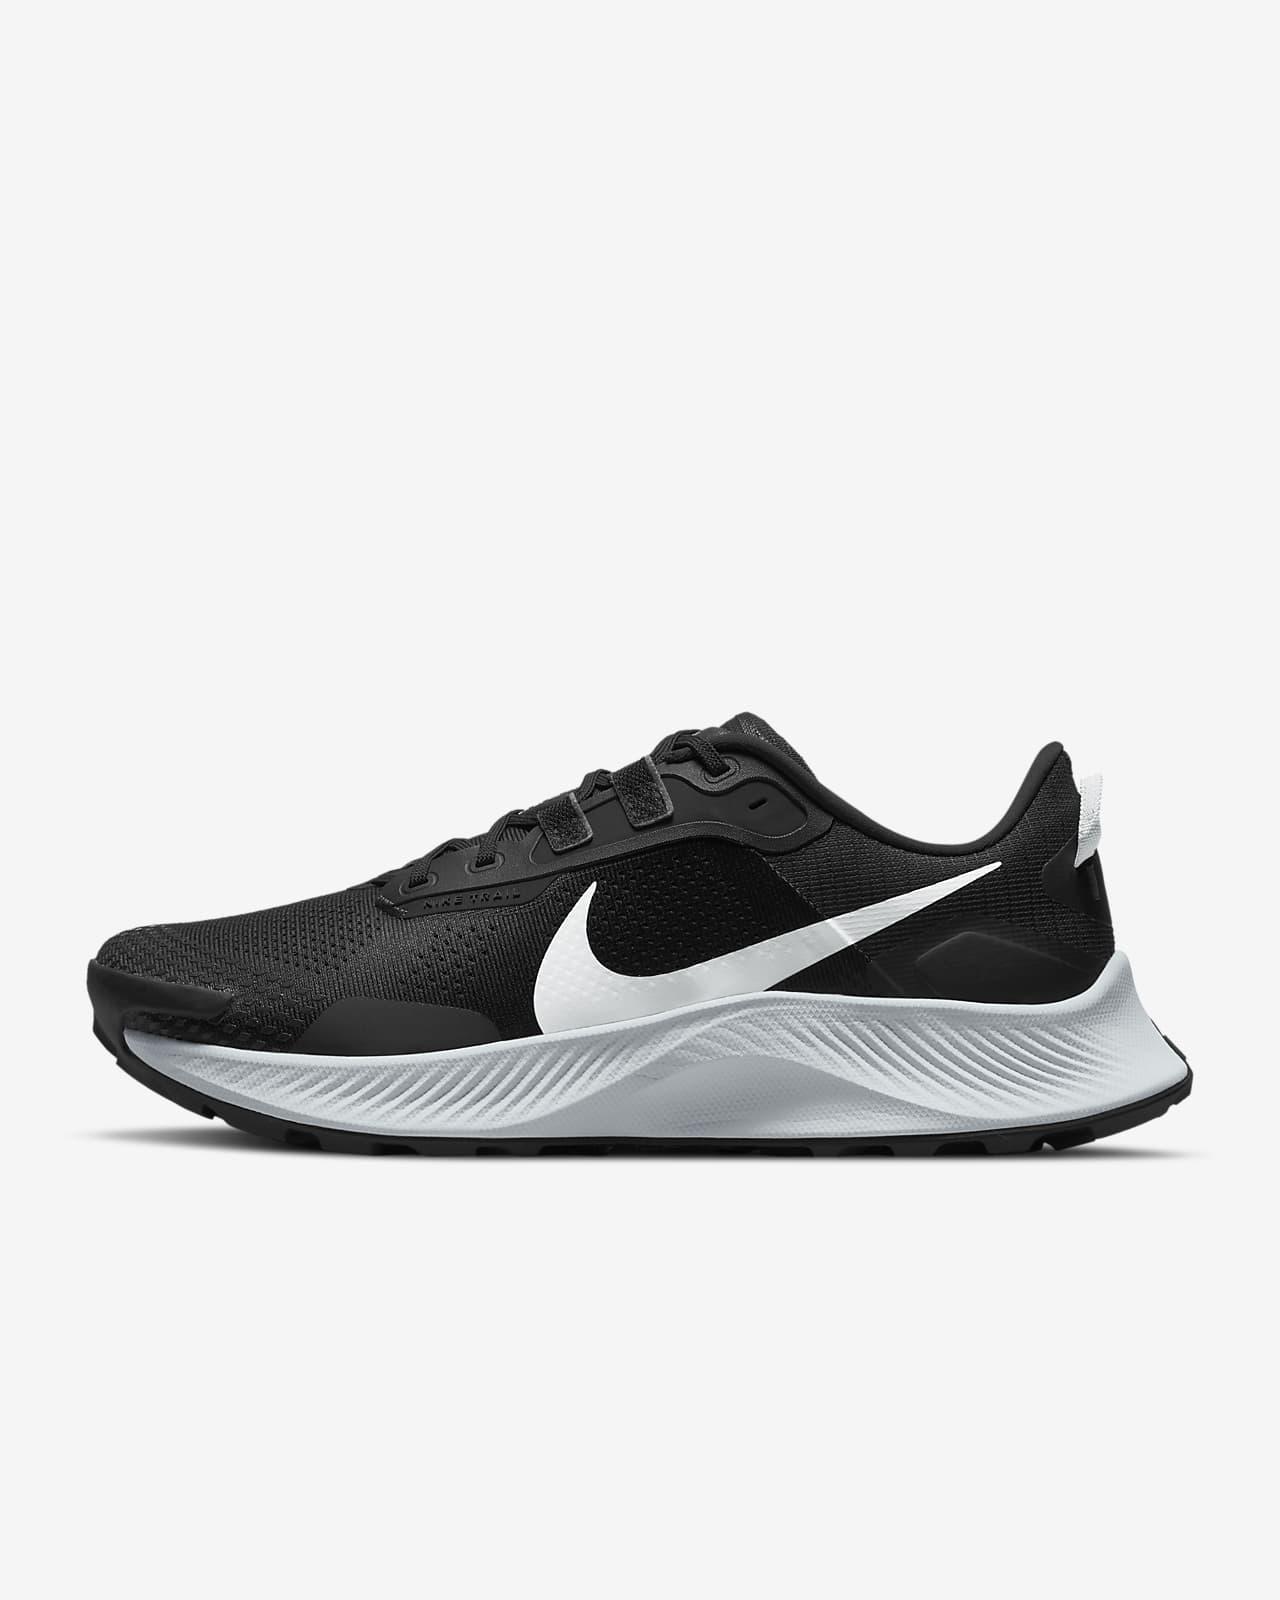 Nike Pegasus Trail 3 terrengløpesko til herre